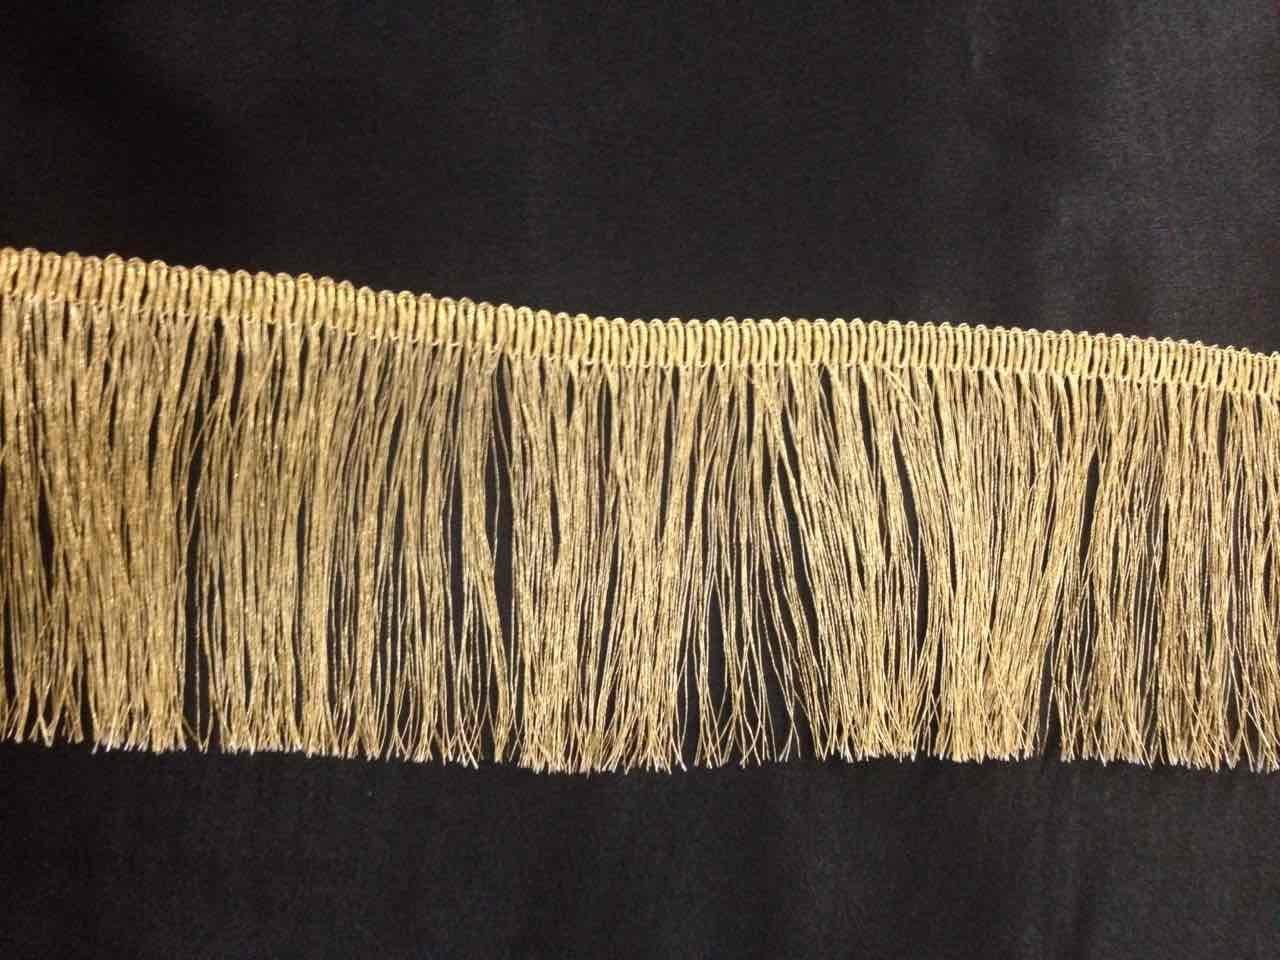 Gold lurex Metallic Fringe Dress bordo 6,3cm, artigianato, fashion, 0,9m Mctrimmings